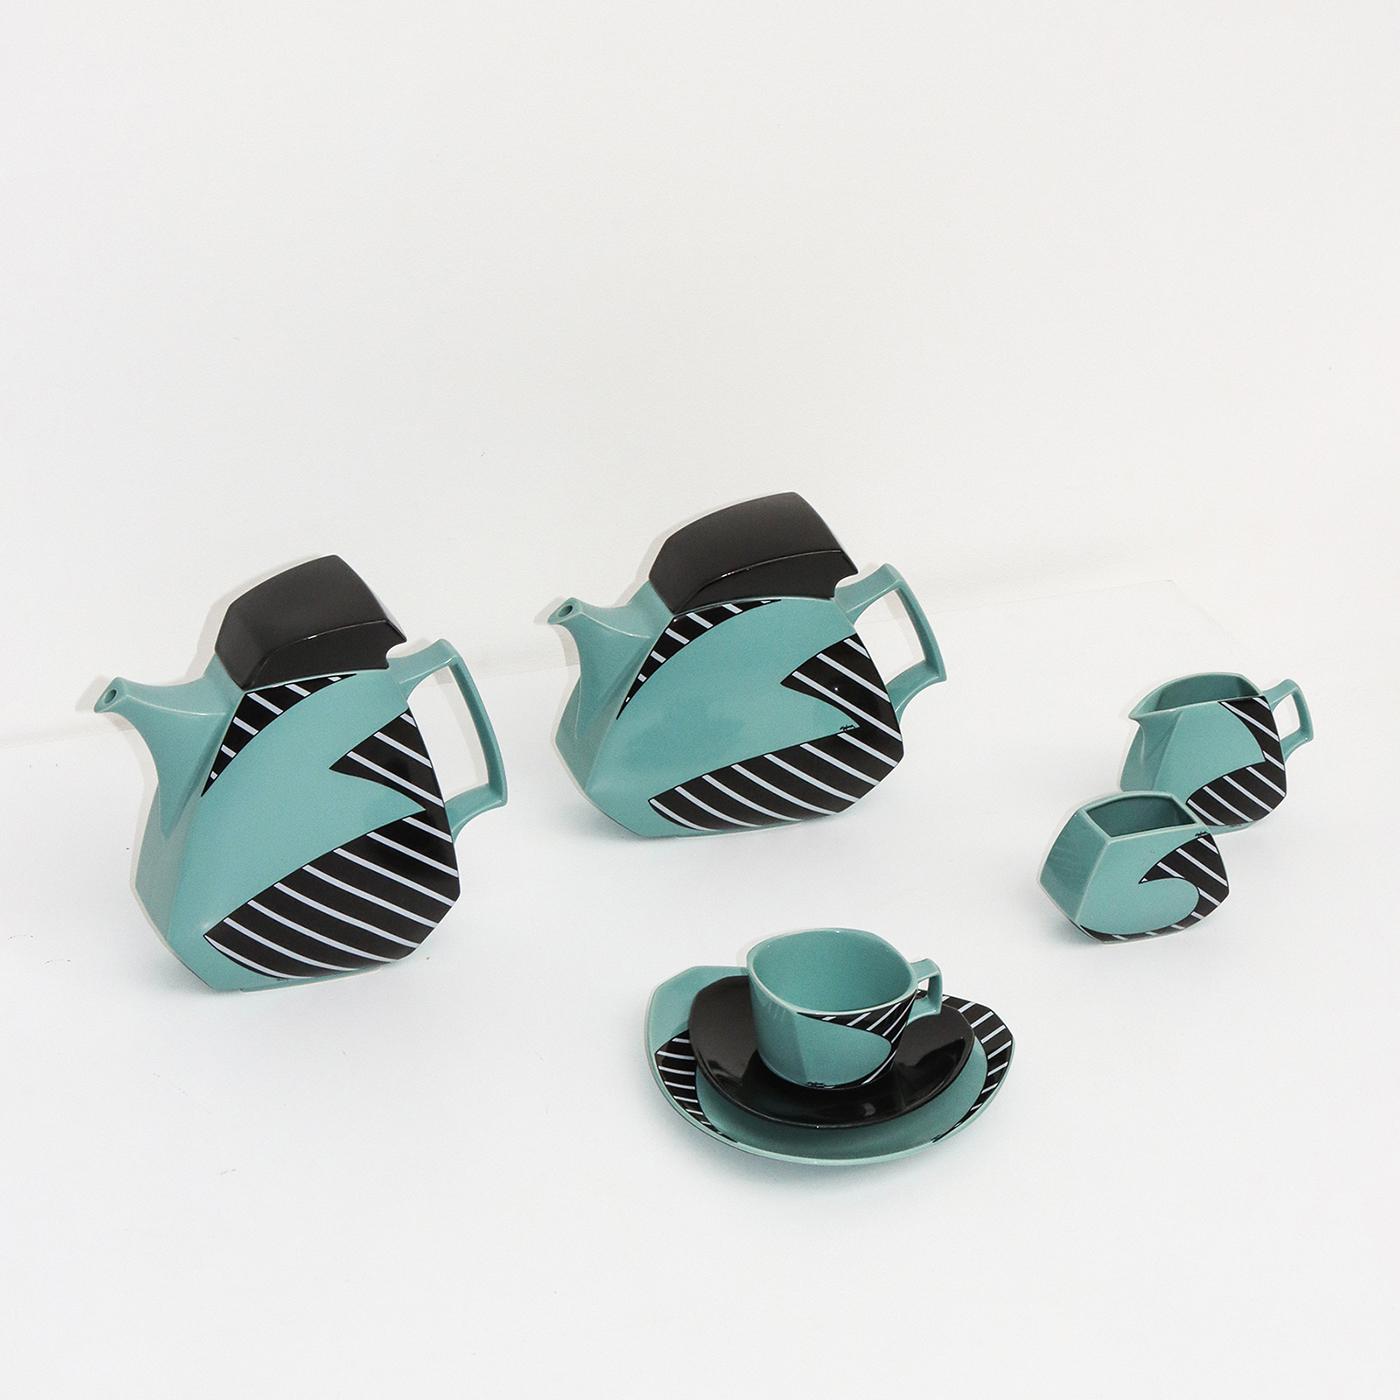 Flash Coffee and tea set by Dorothy Hafner for Rosenthal